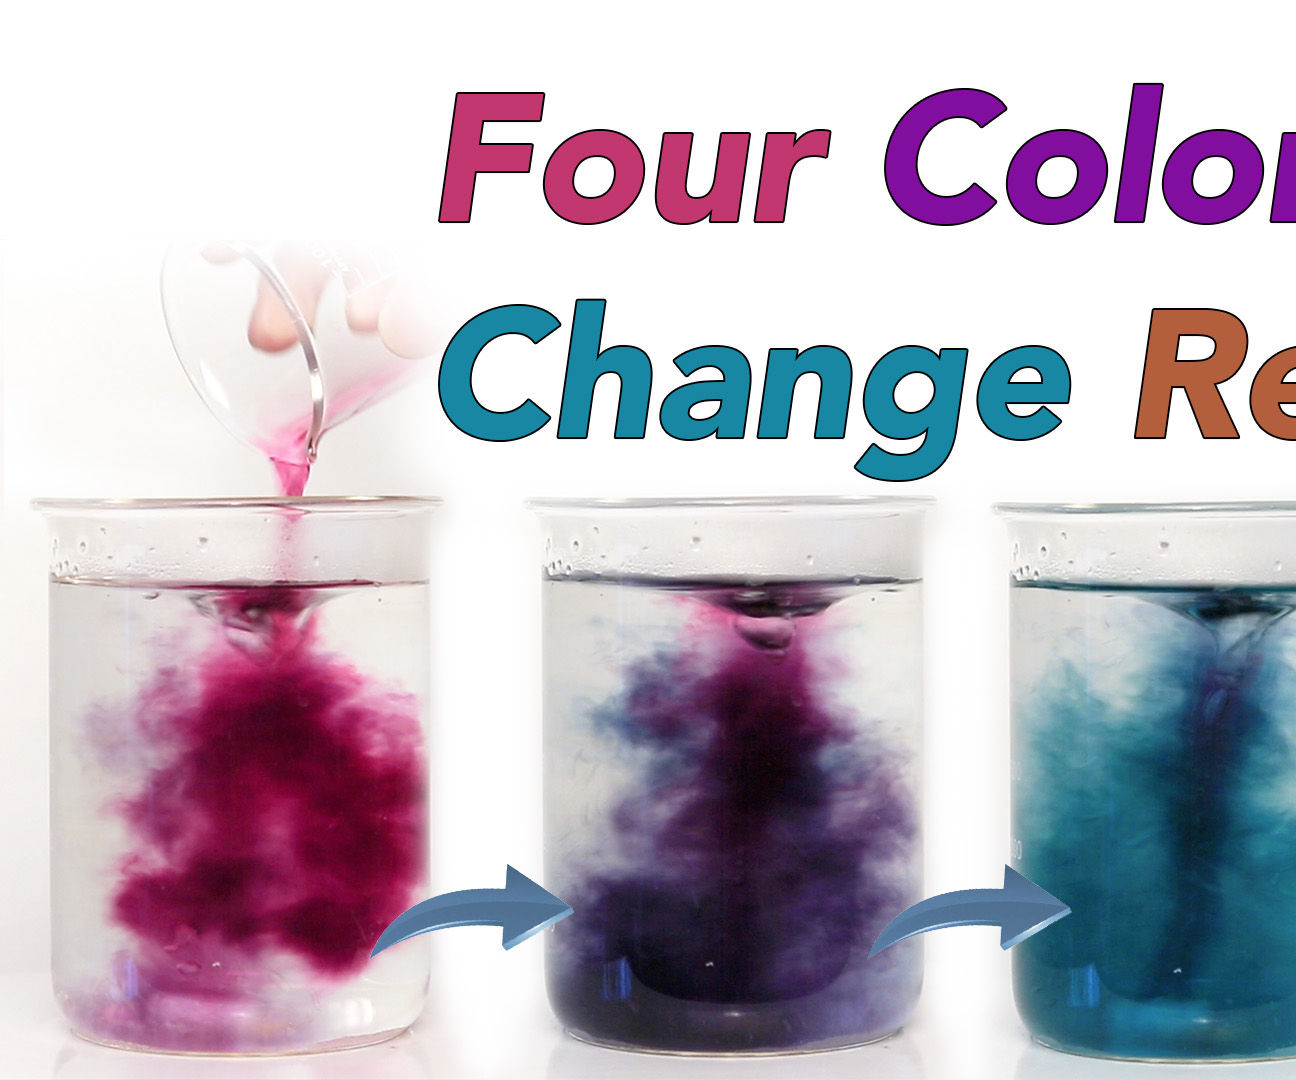 Chameleon chemical reaction - beautiful four steps colour change